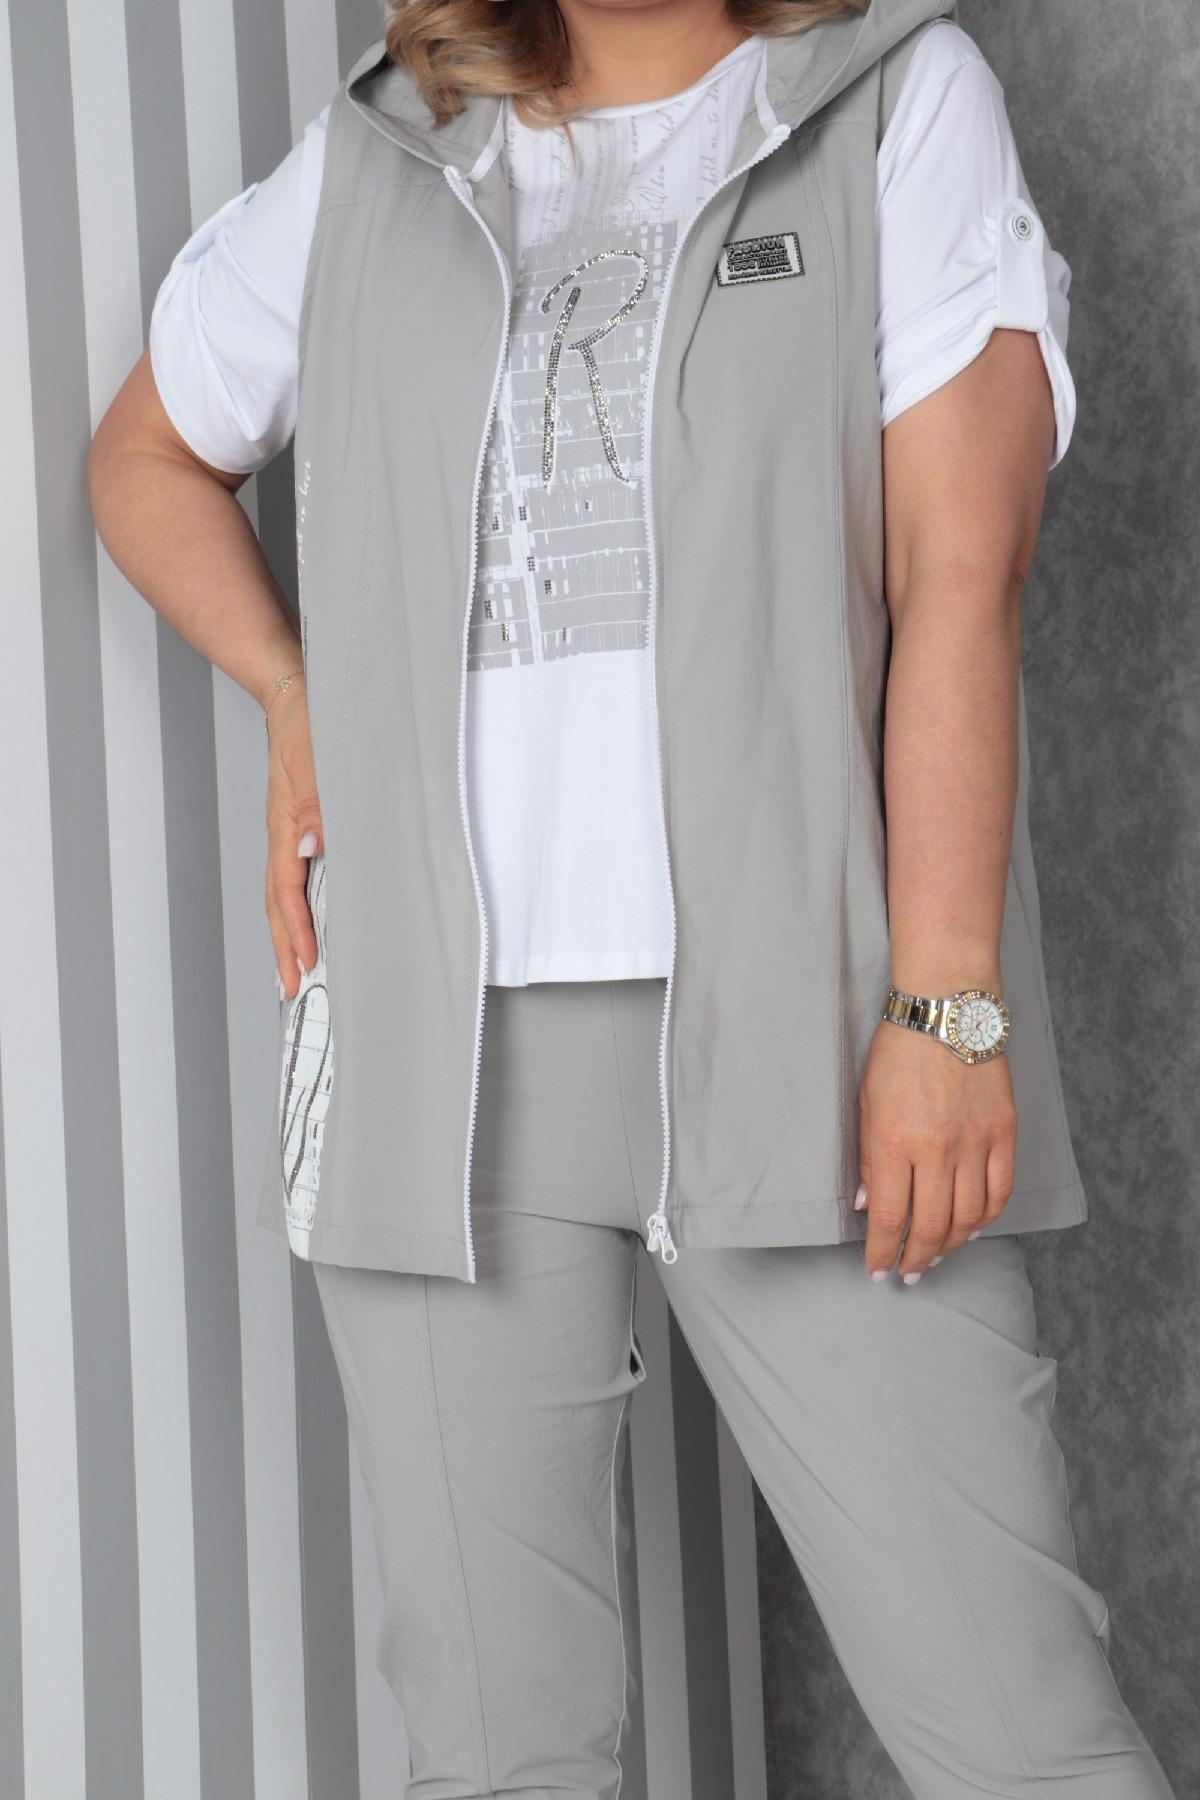 Women's 3 Piece Suits-Light Grey